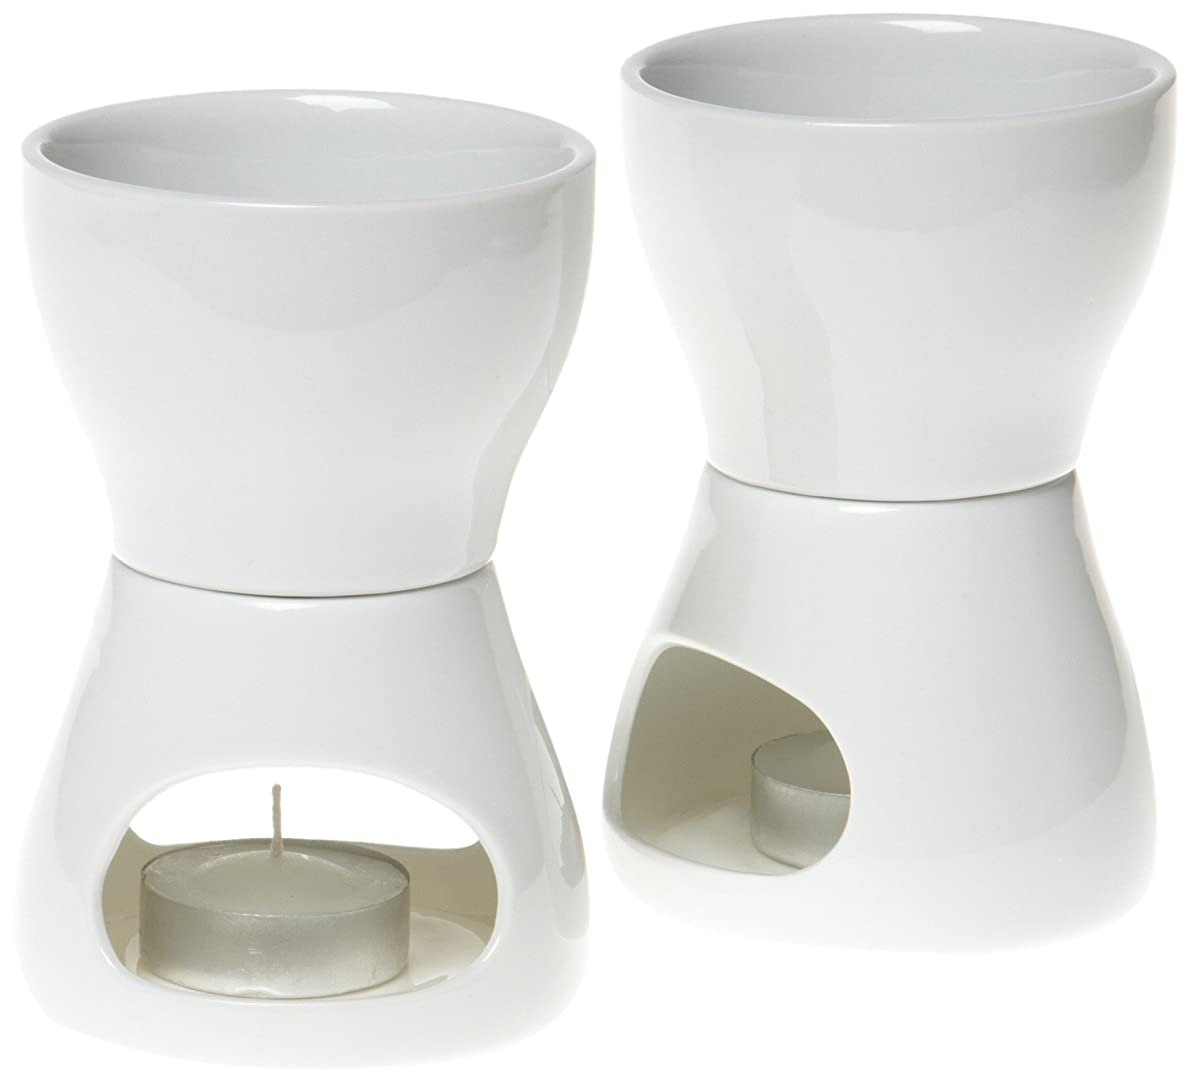 Norpro 213 Porcelain Butter Warmer, 2pc set